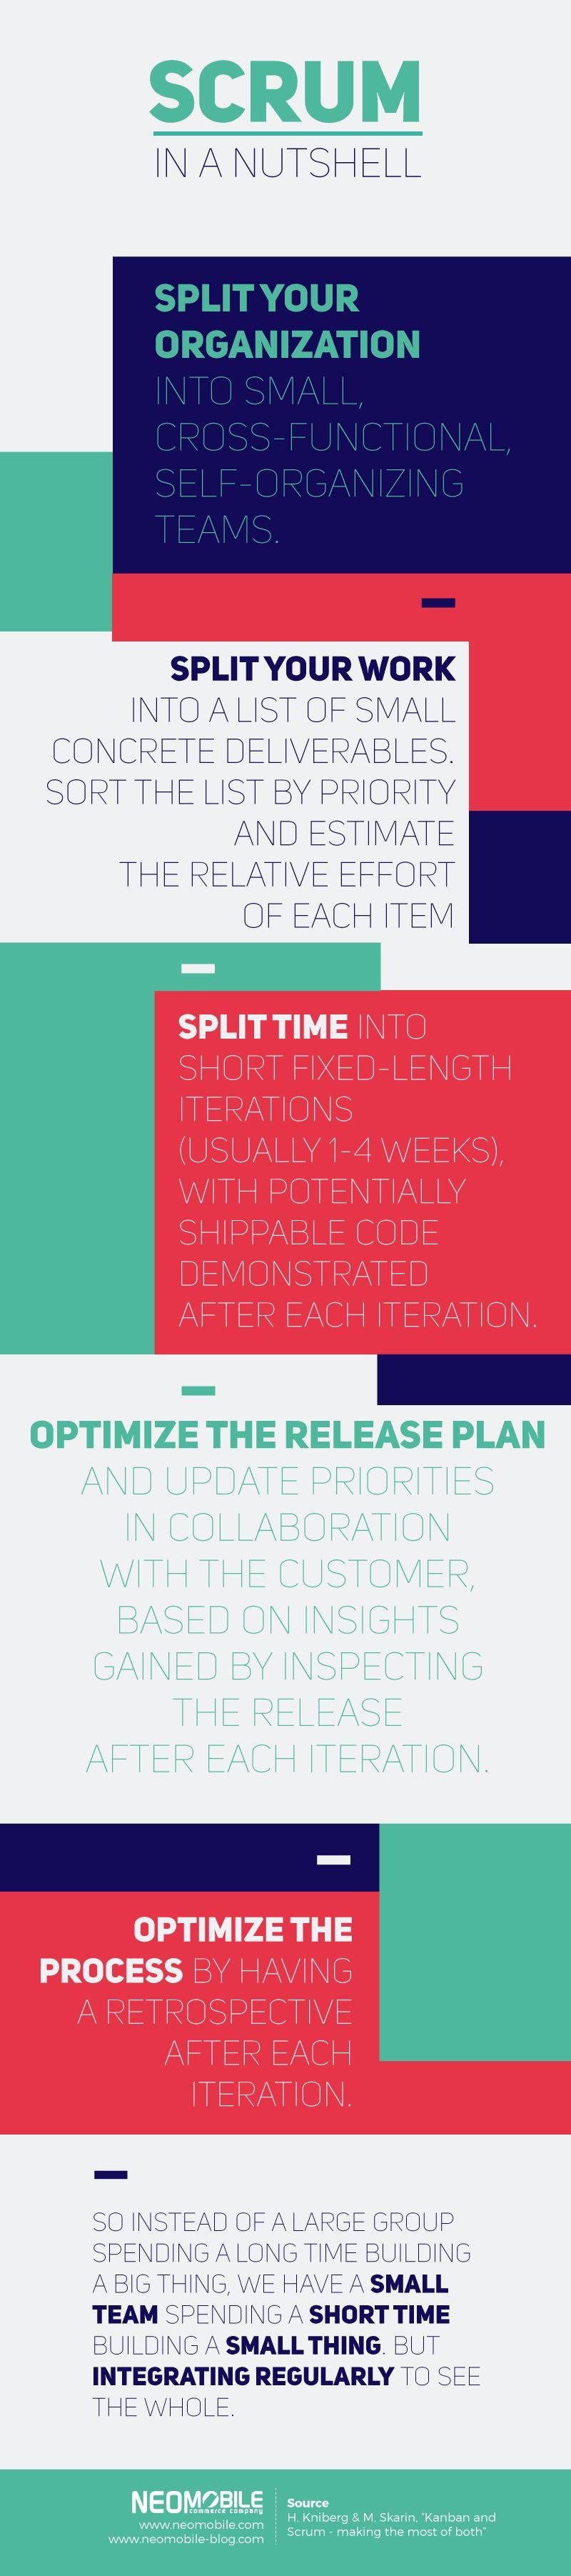 Agile Basics scrum, as one of #agile methodologies, is actually the art